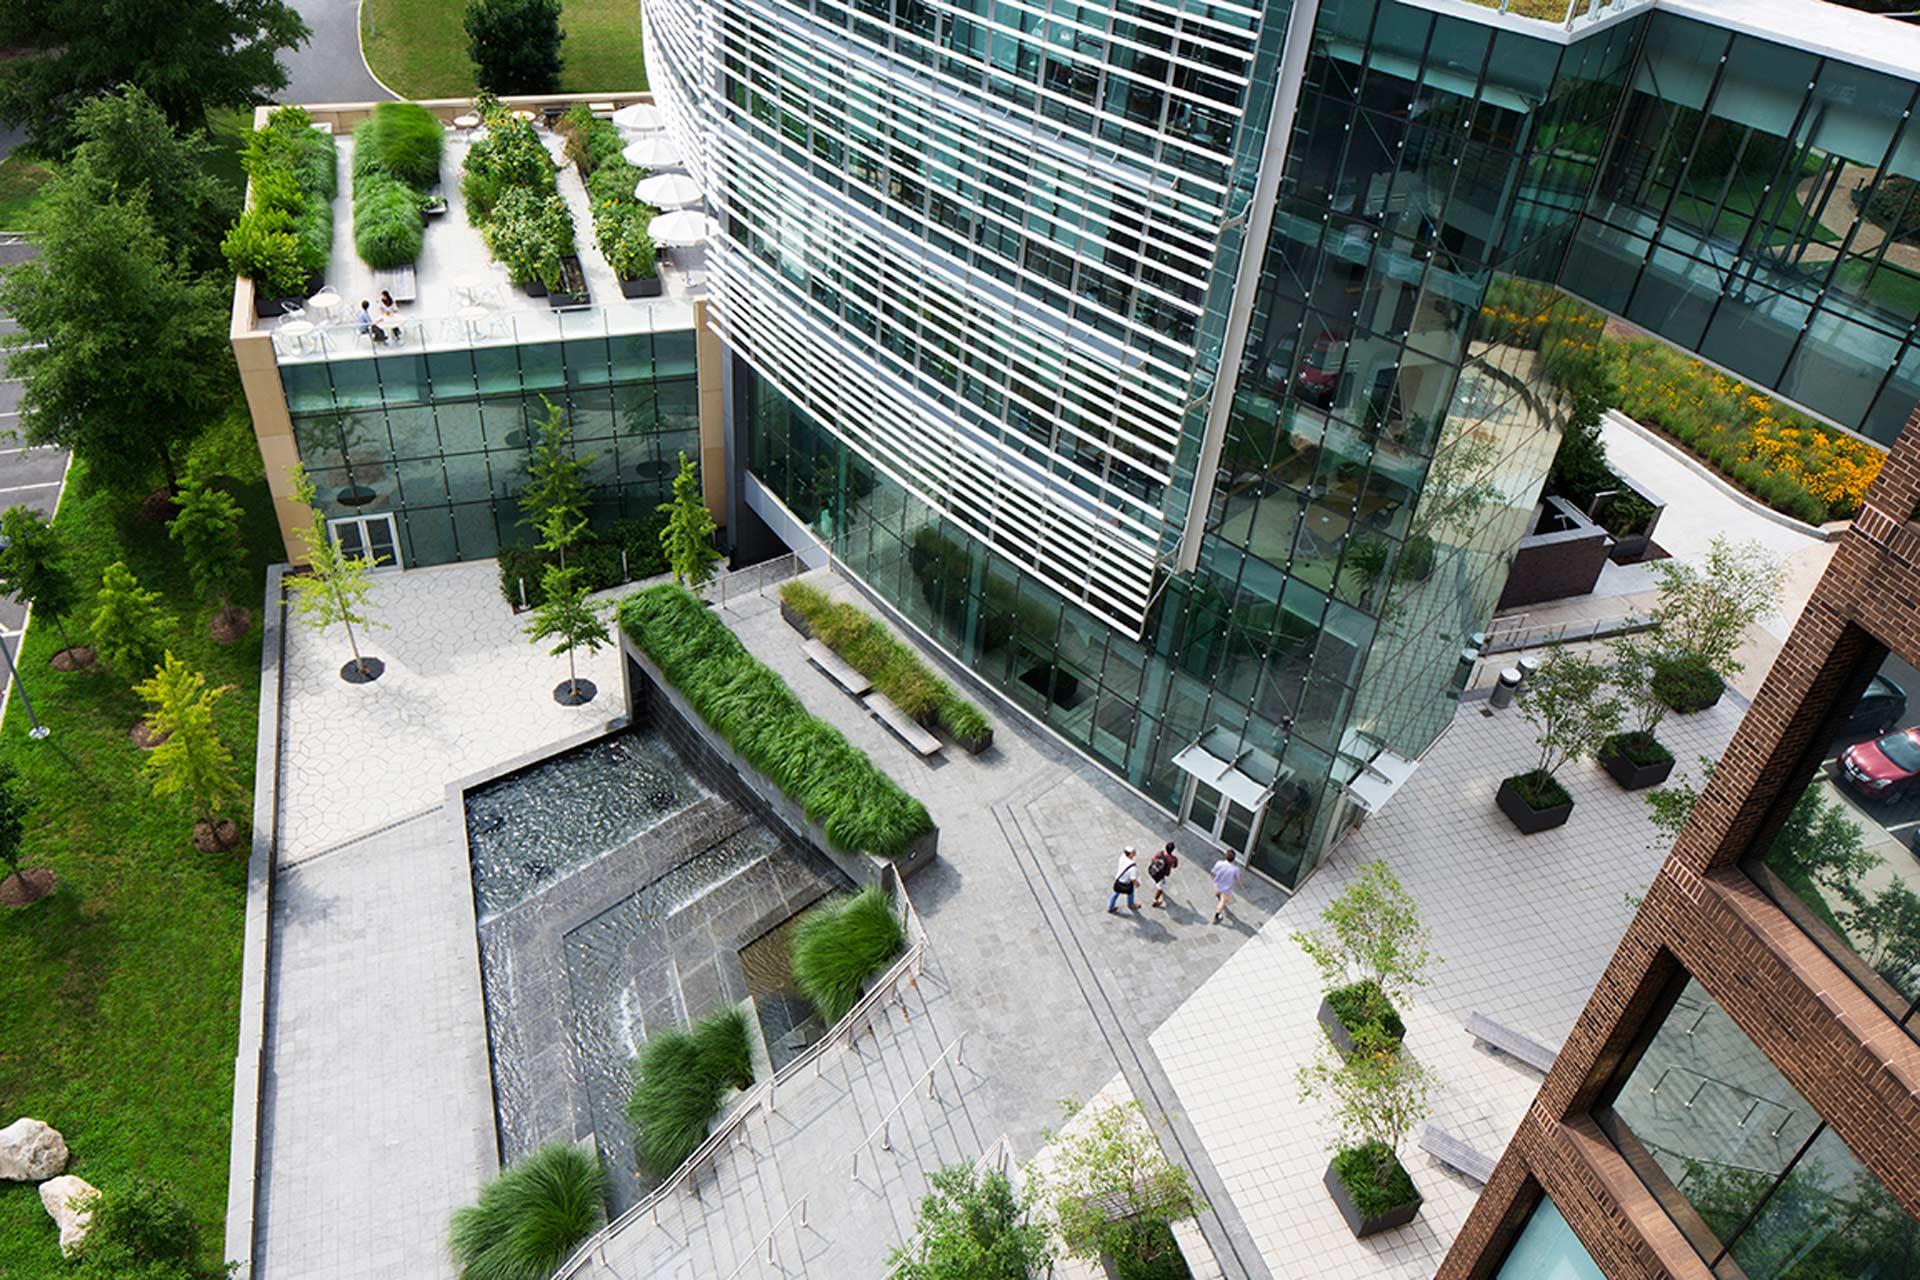 Simons center park dirtworks 13 site plan landscape for Landscape design center